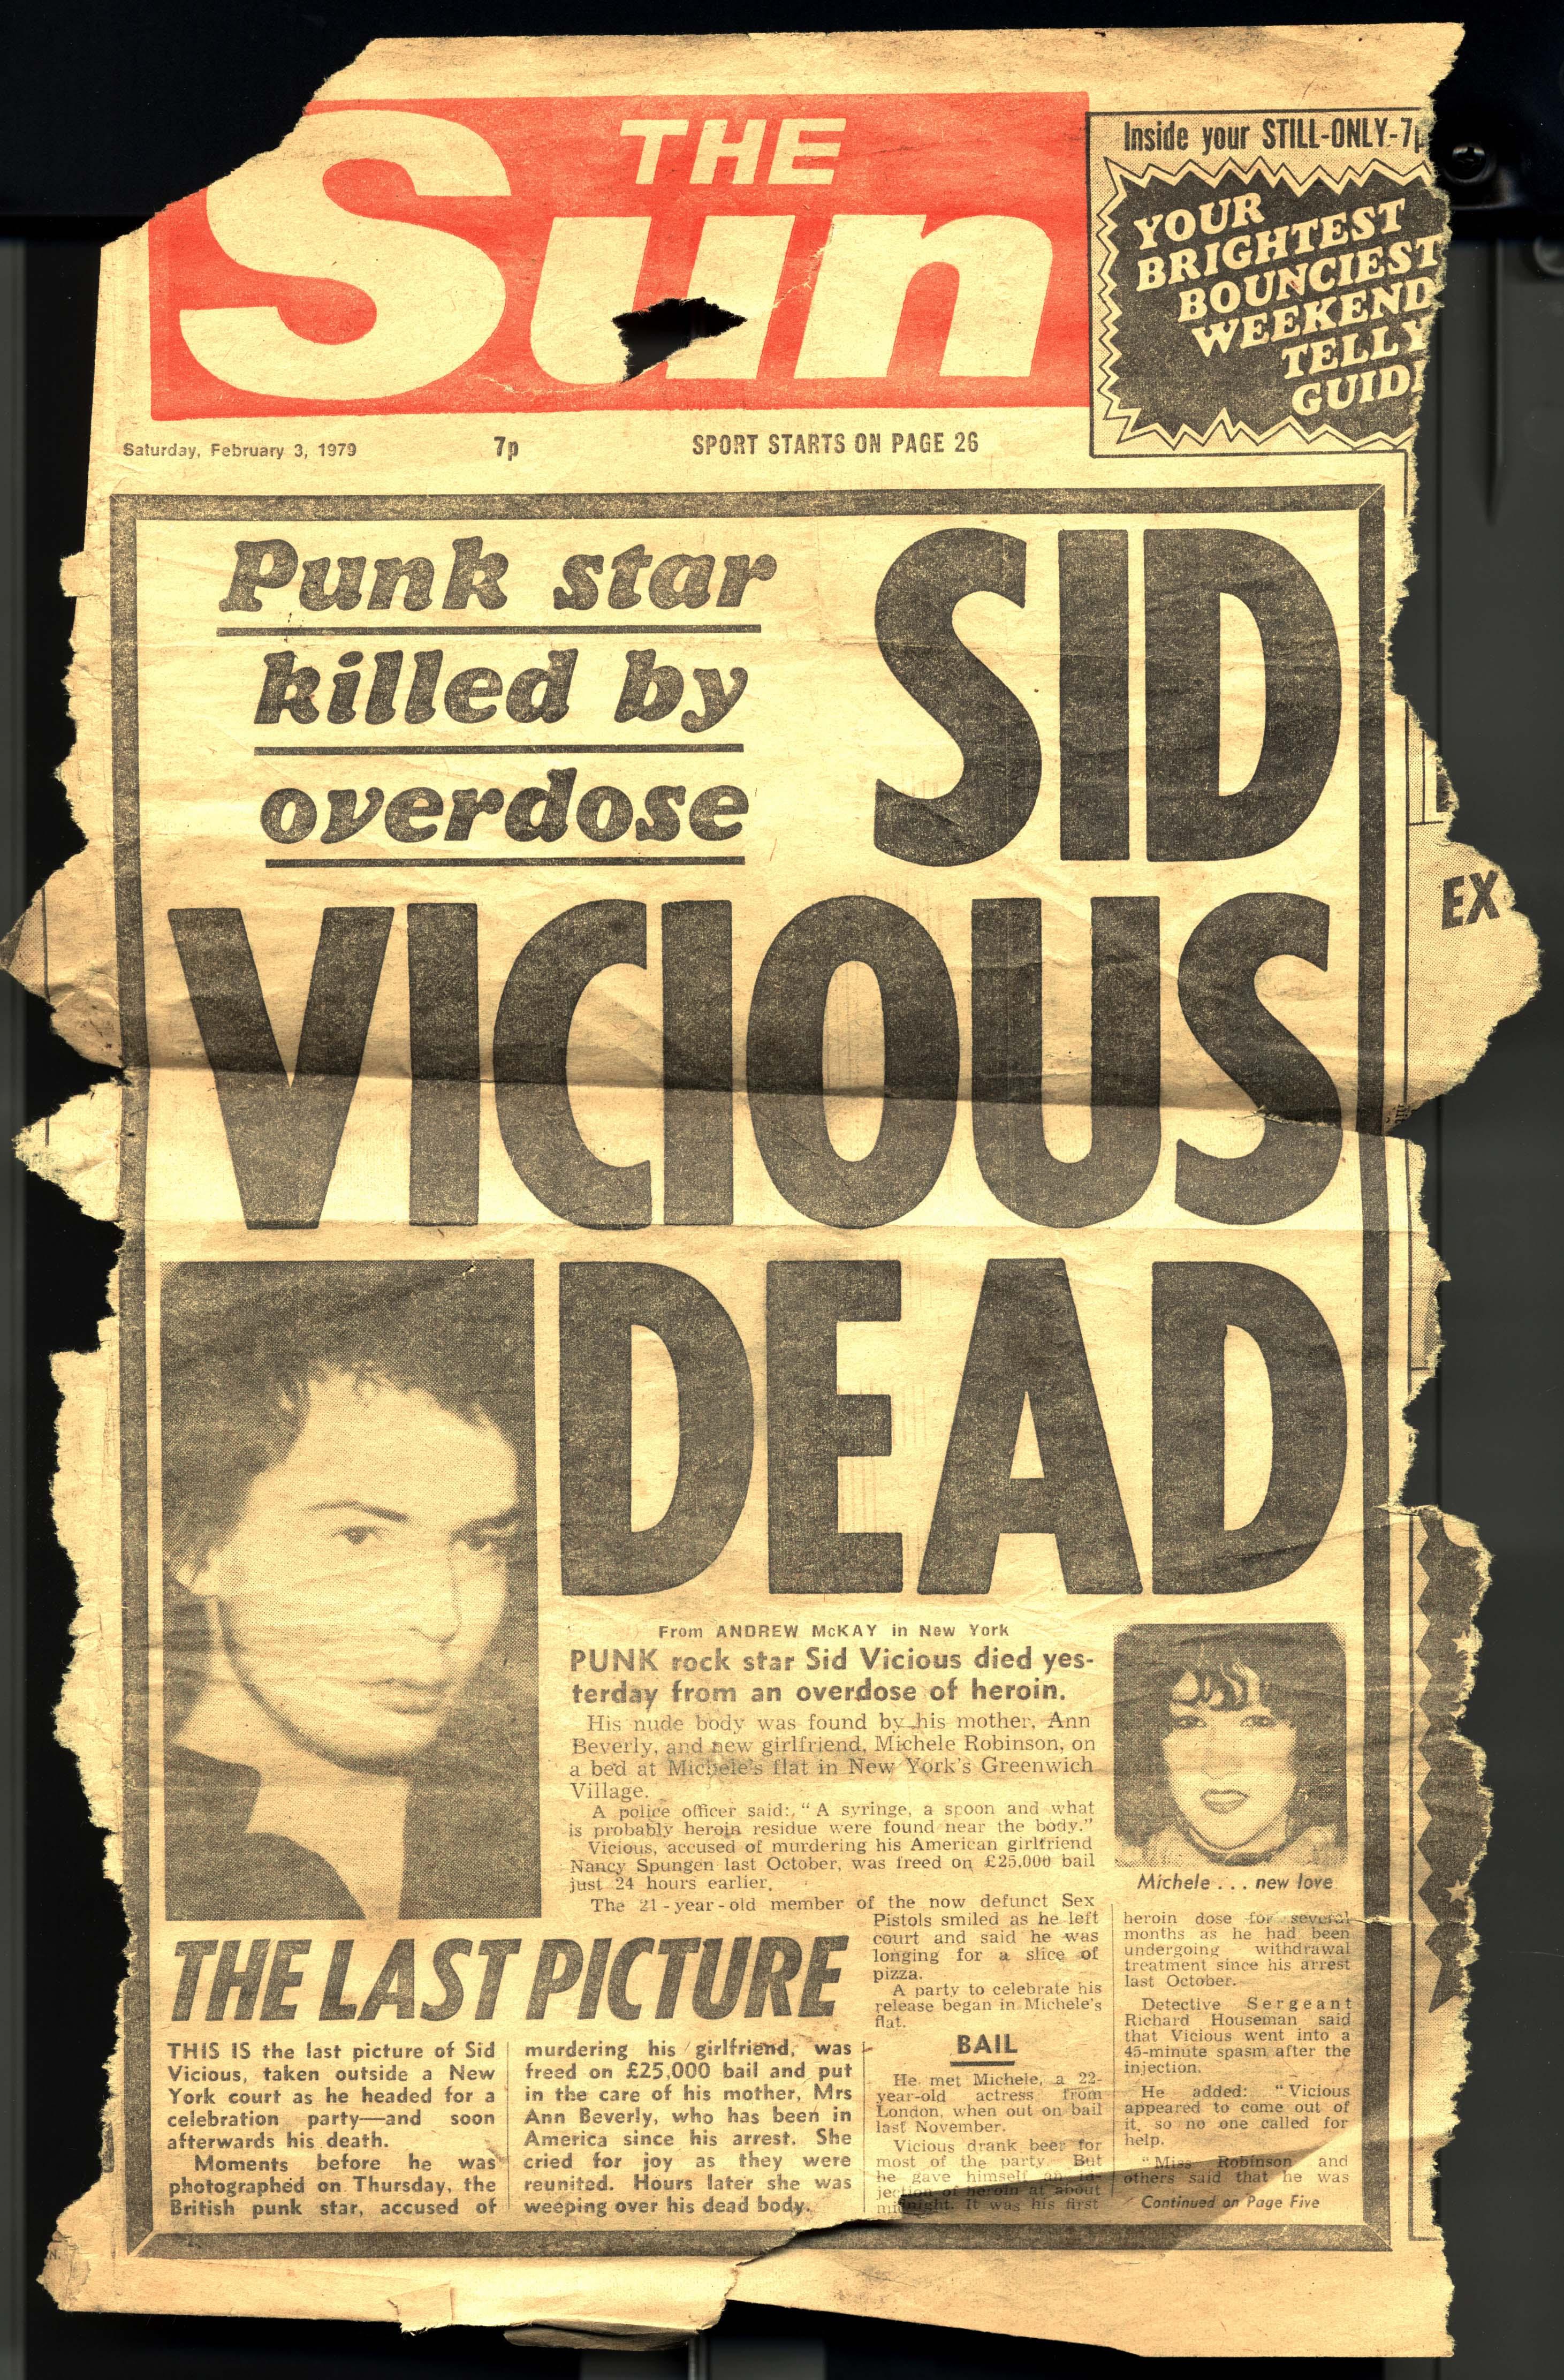 The Sun, February 3es 1979